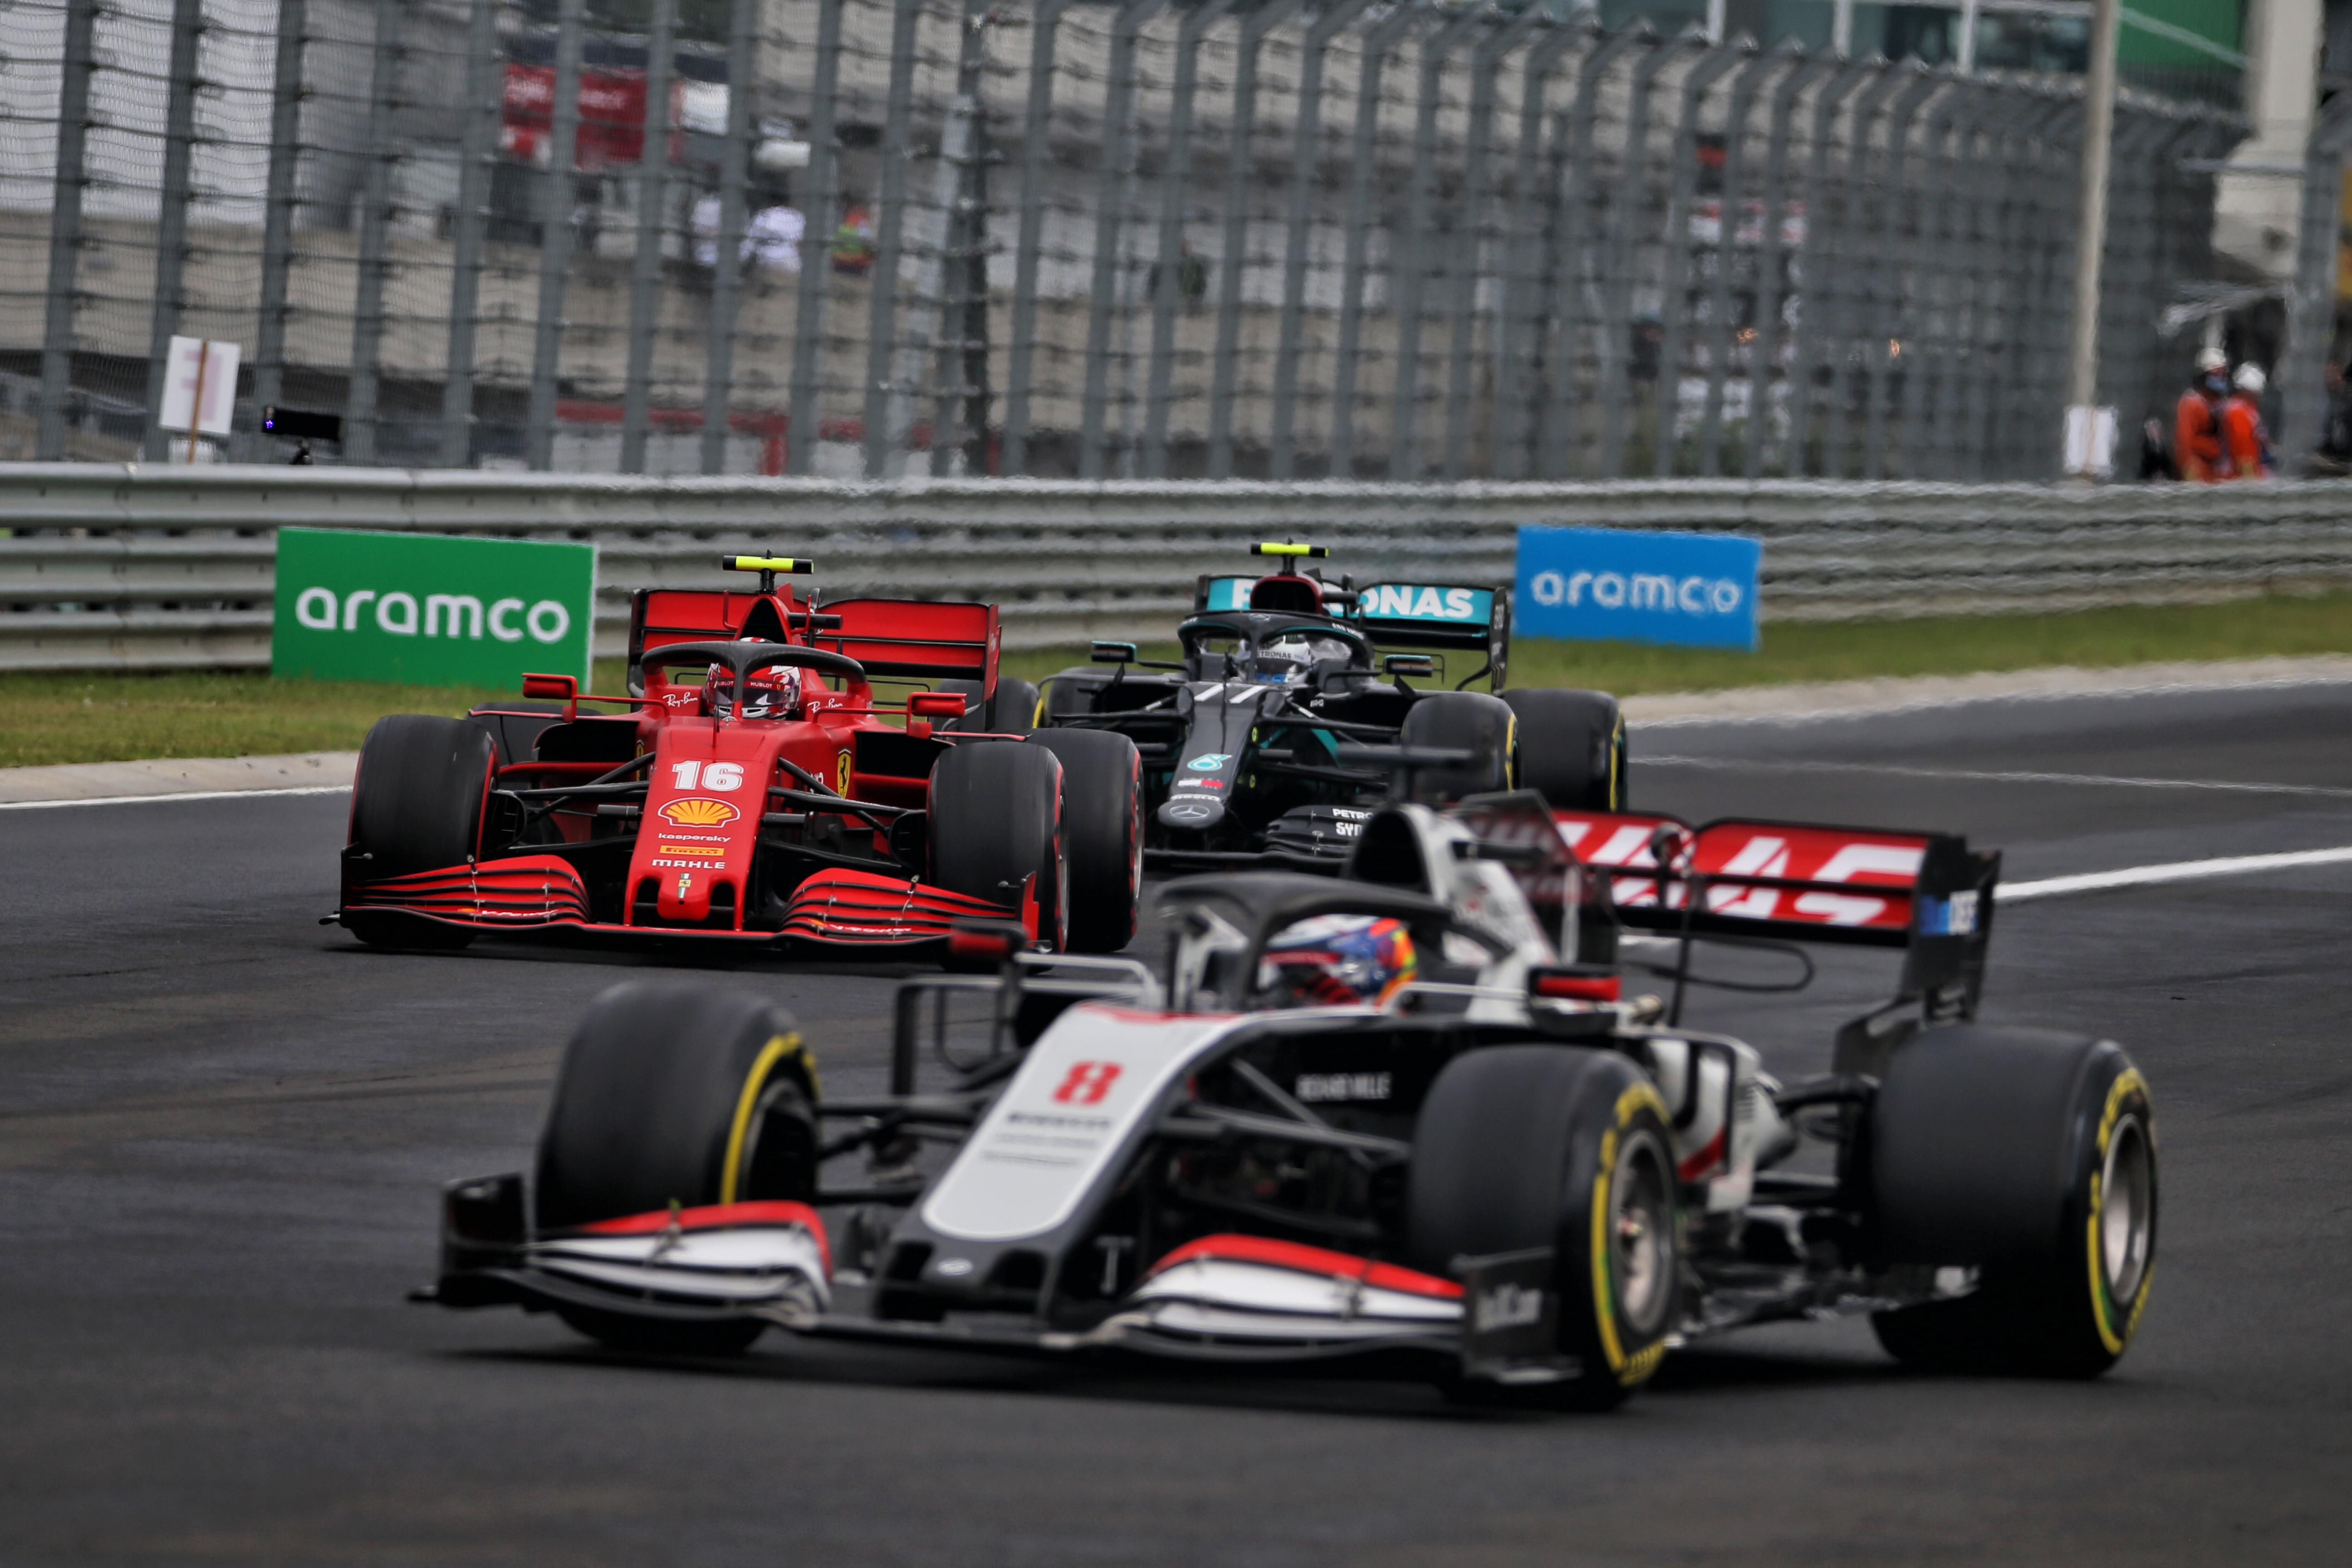 Haas Ferrari Mercedes Hungarian Grand Prix 2020